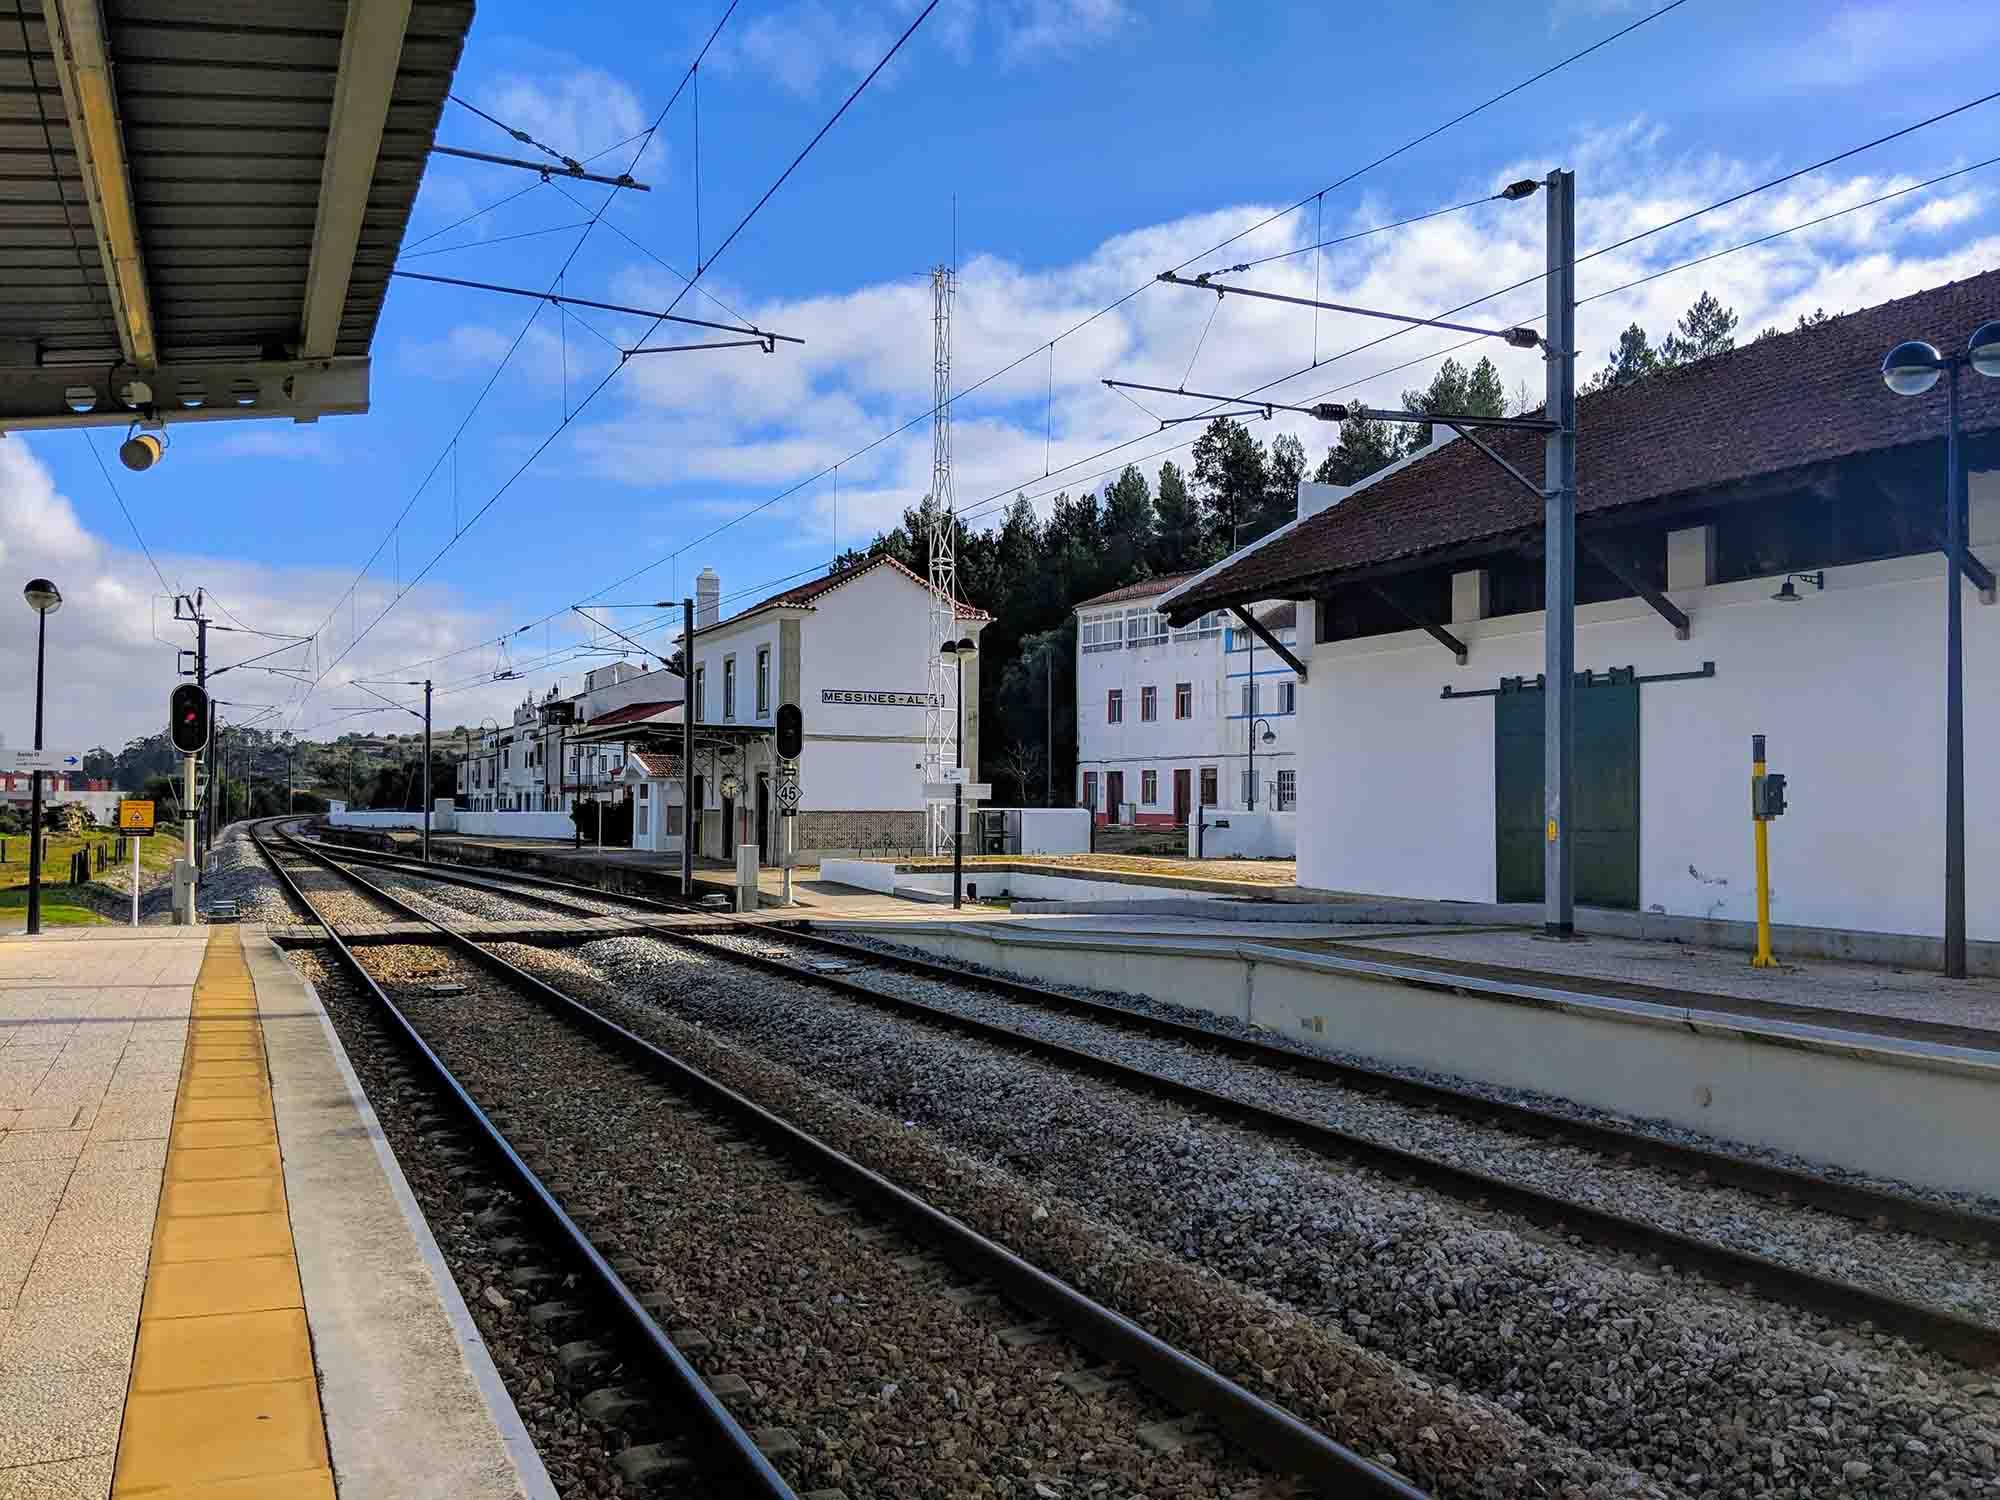 Messines-Alte Train Station